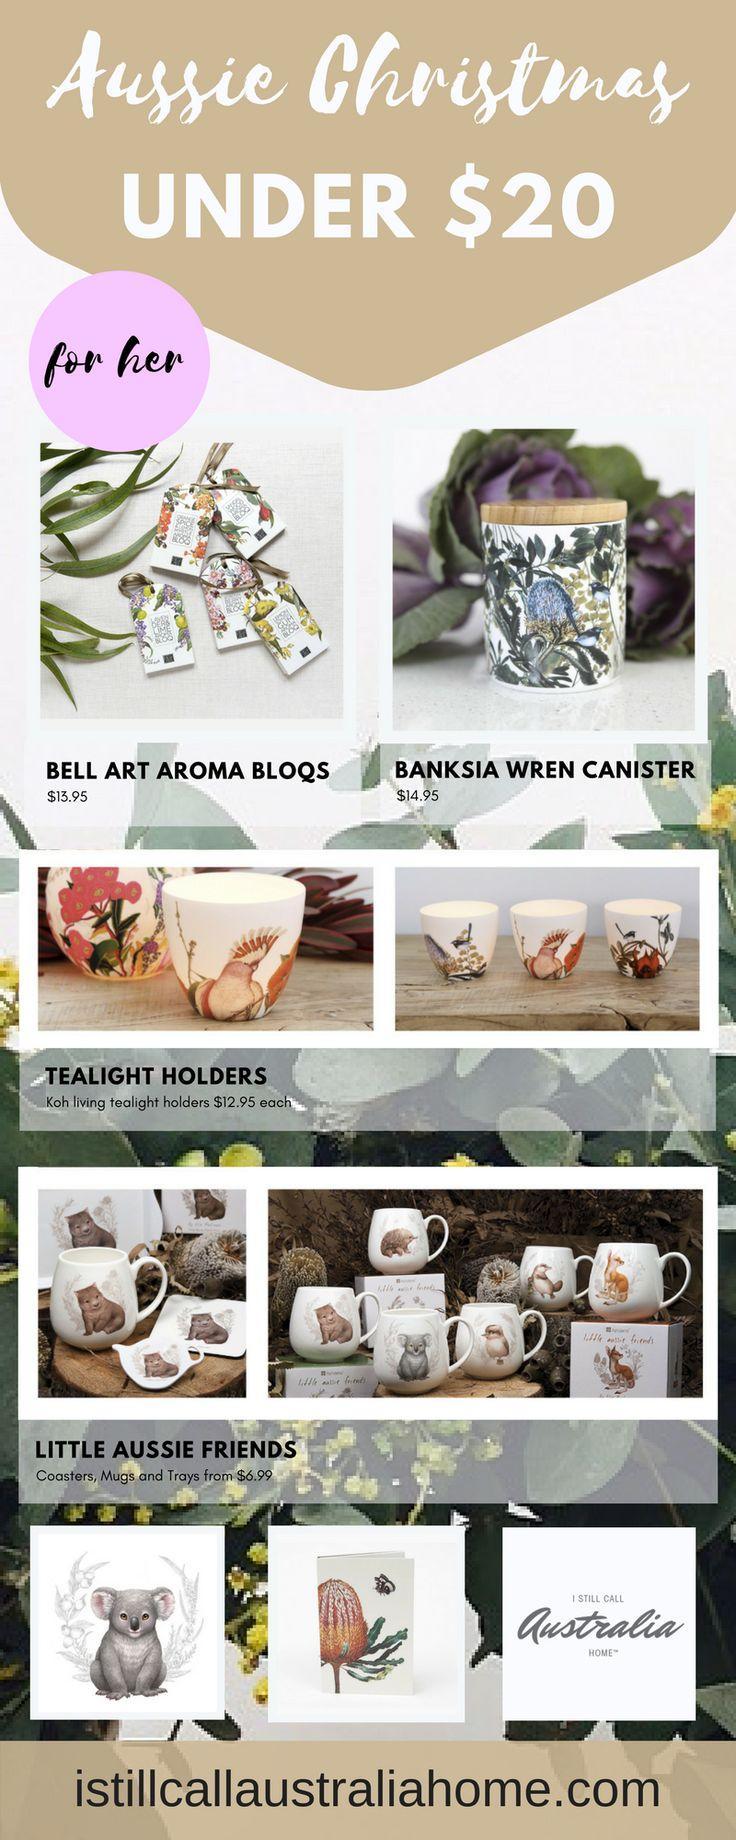 Acorn Homewares Gifts Strathalbyn Gift Ftempo